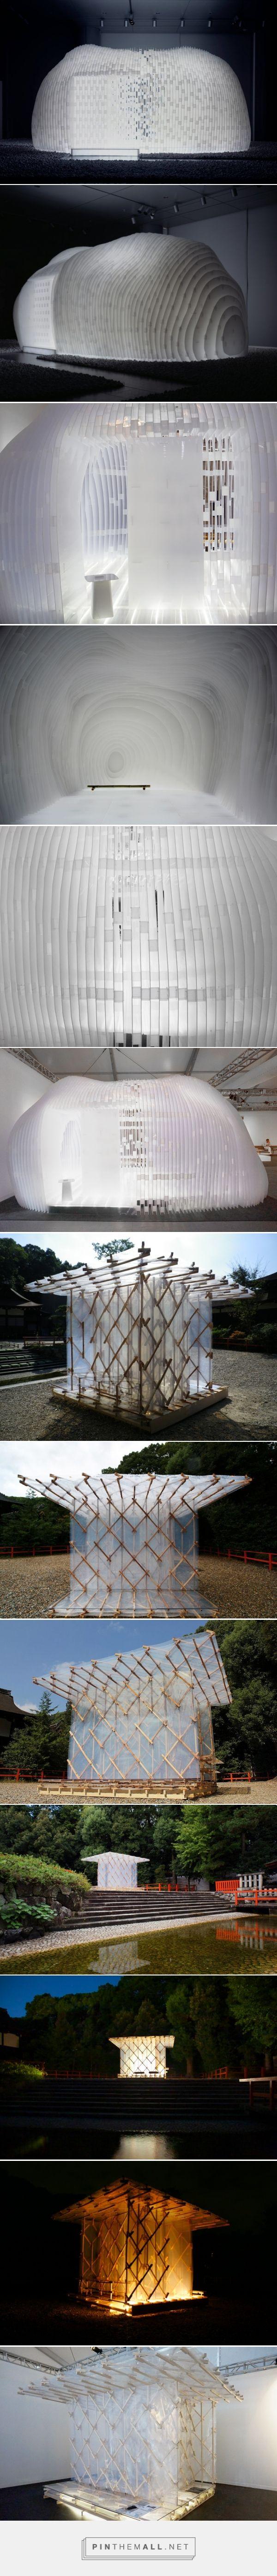 kengo kuma exhibits two mobile pavilions at design miami/ - created via https://pinthemall.net